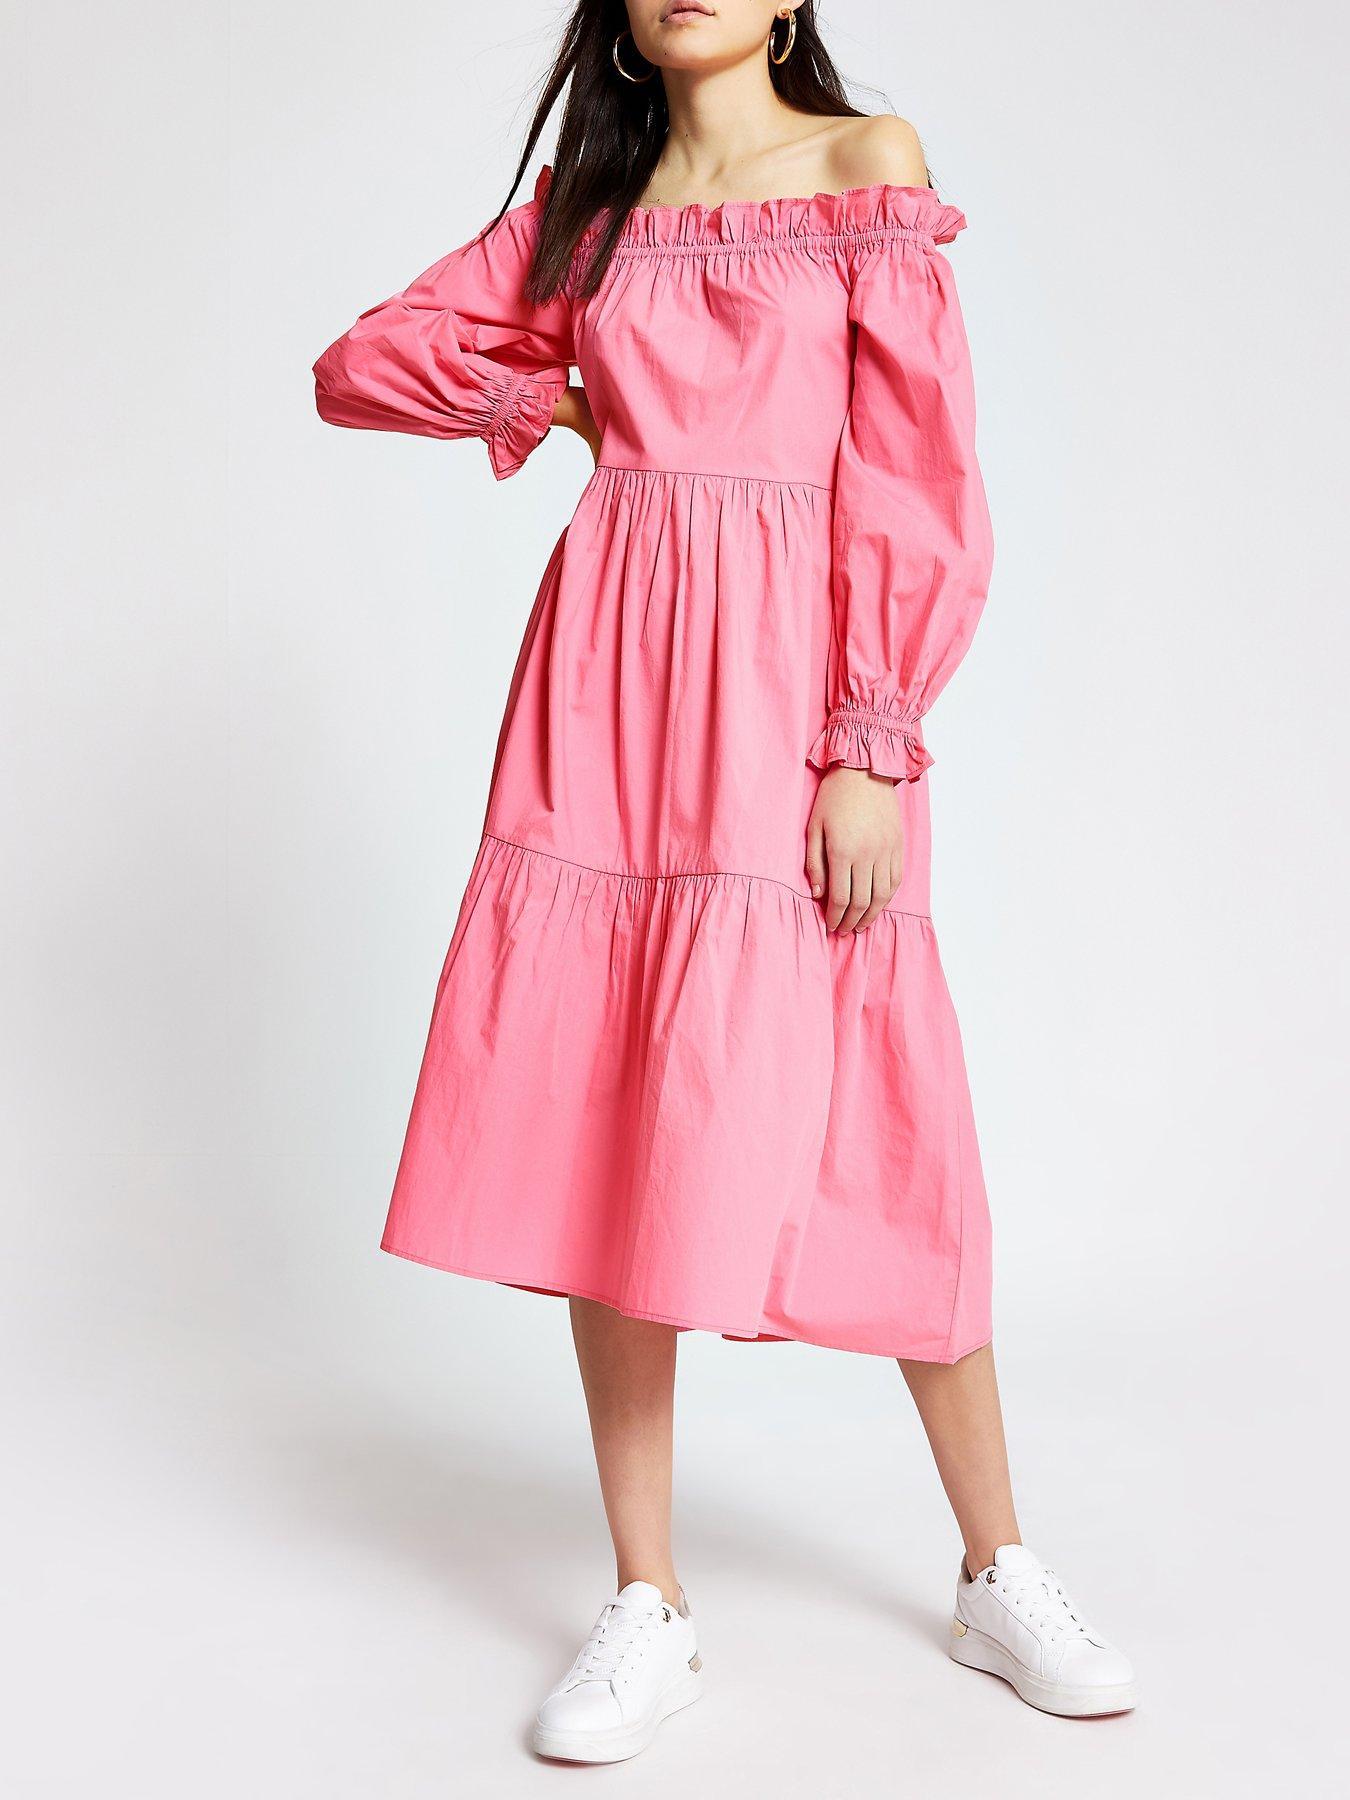 Stunning Brand New Womens River Island Ivory Midi Summer Dress with Belt 8-16